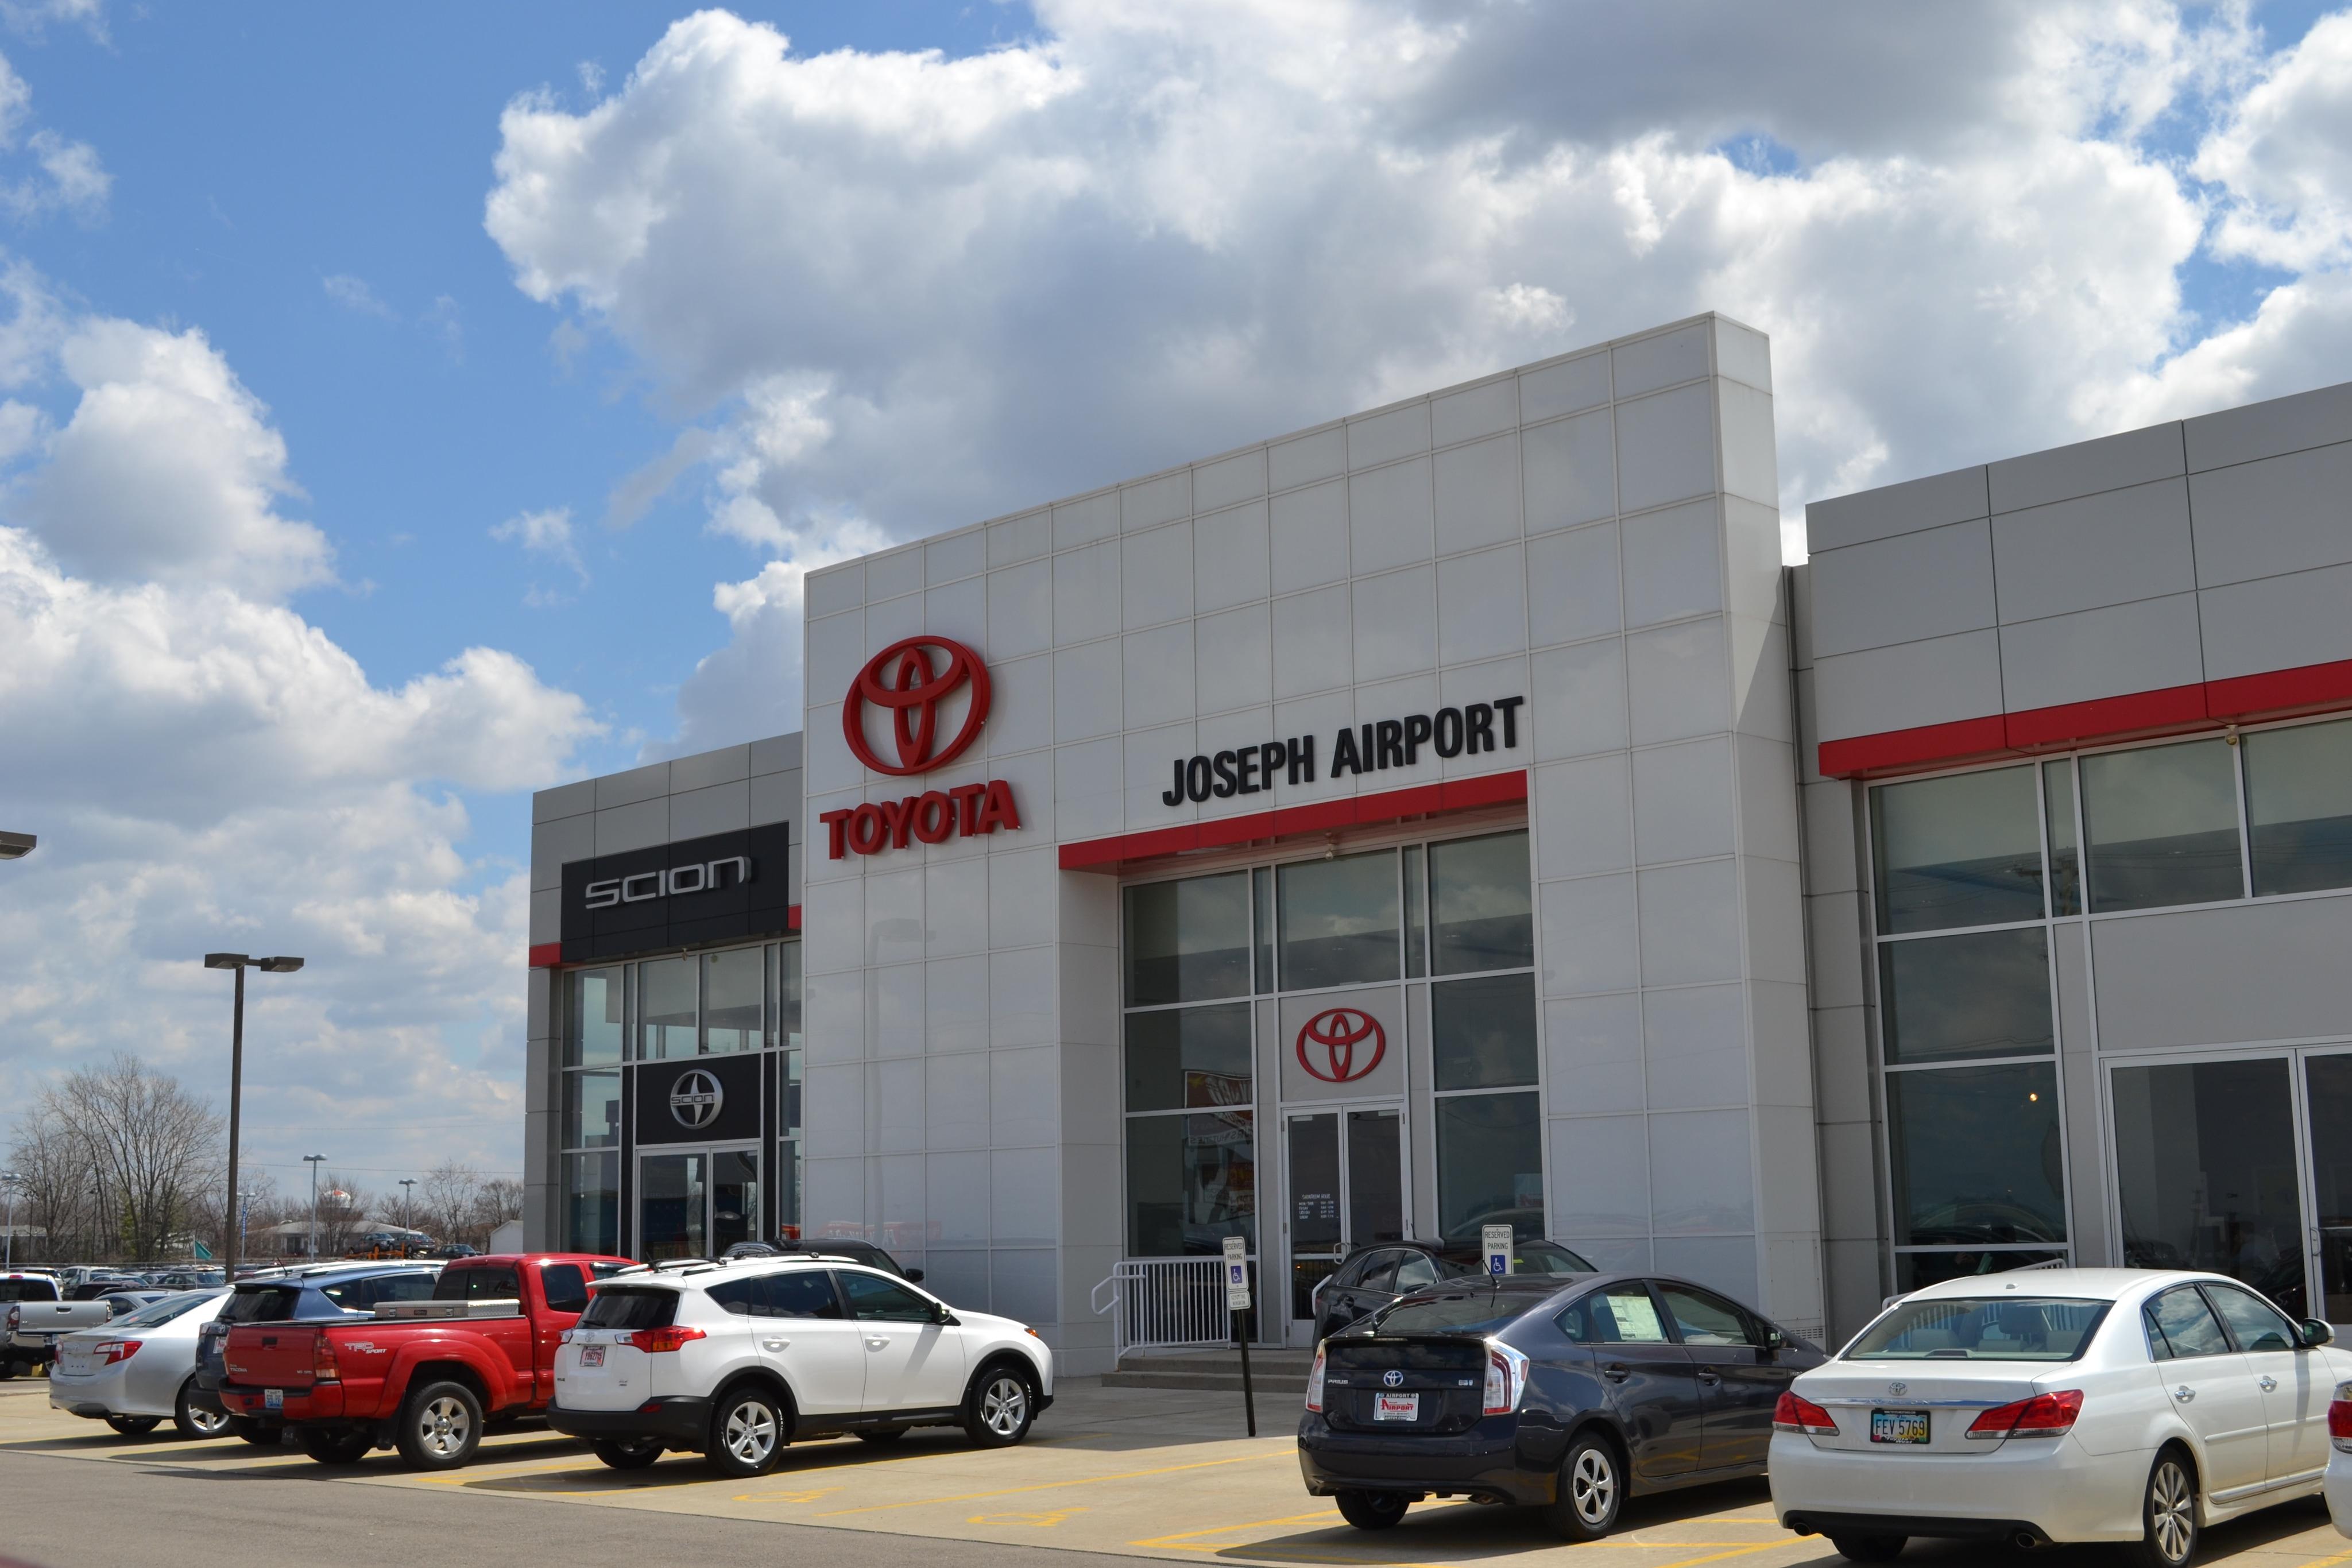 Toyota Dealership Dayton Ohio >> About Joseph Airport Toyota near Dayton, OH